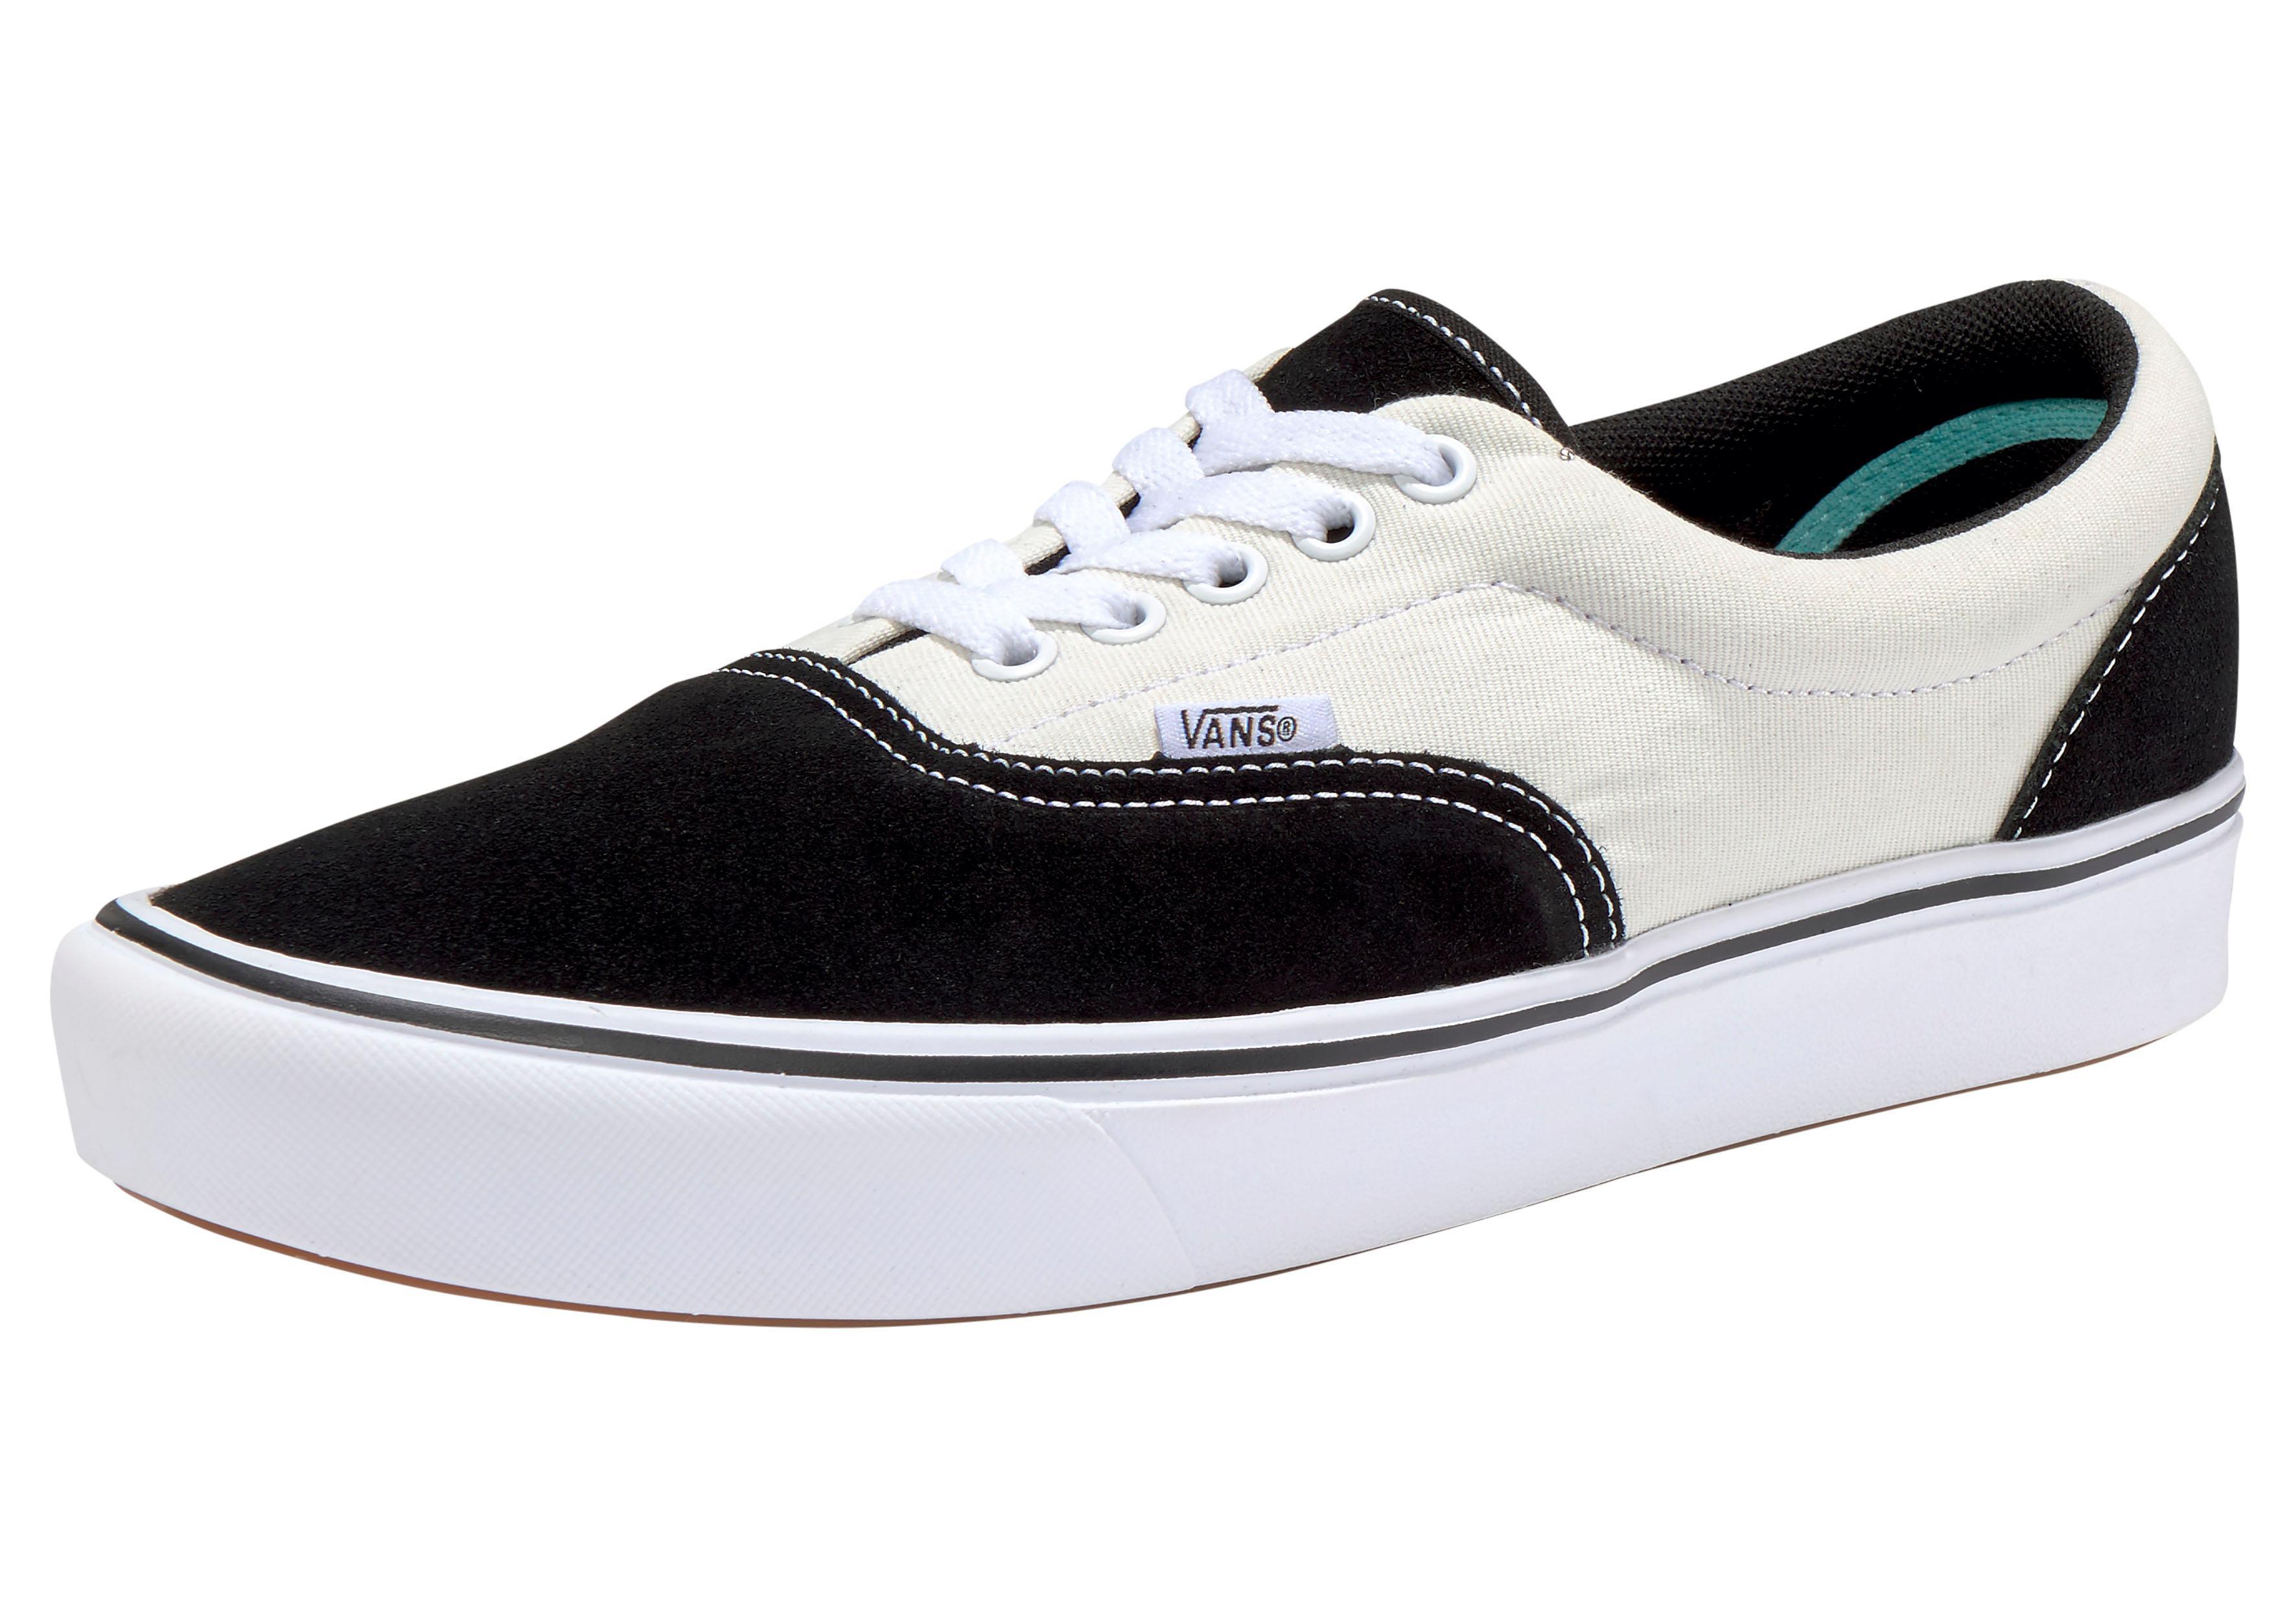 Vans Sneaker »ComfyCush Era« | Schuhe > Sneaker > Sneaker low | Weiß | Gummi - Leder | Vans